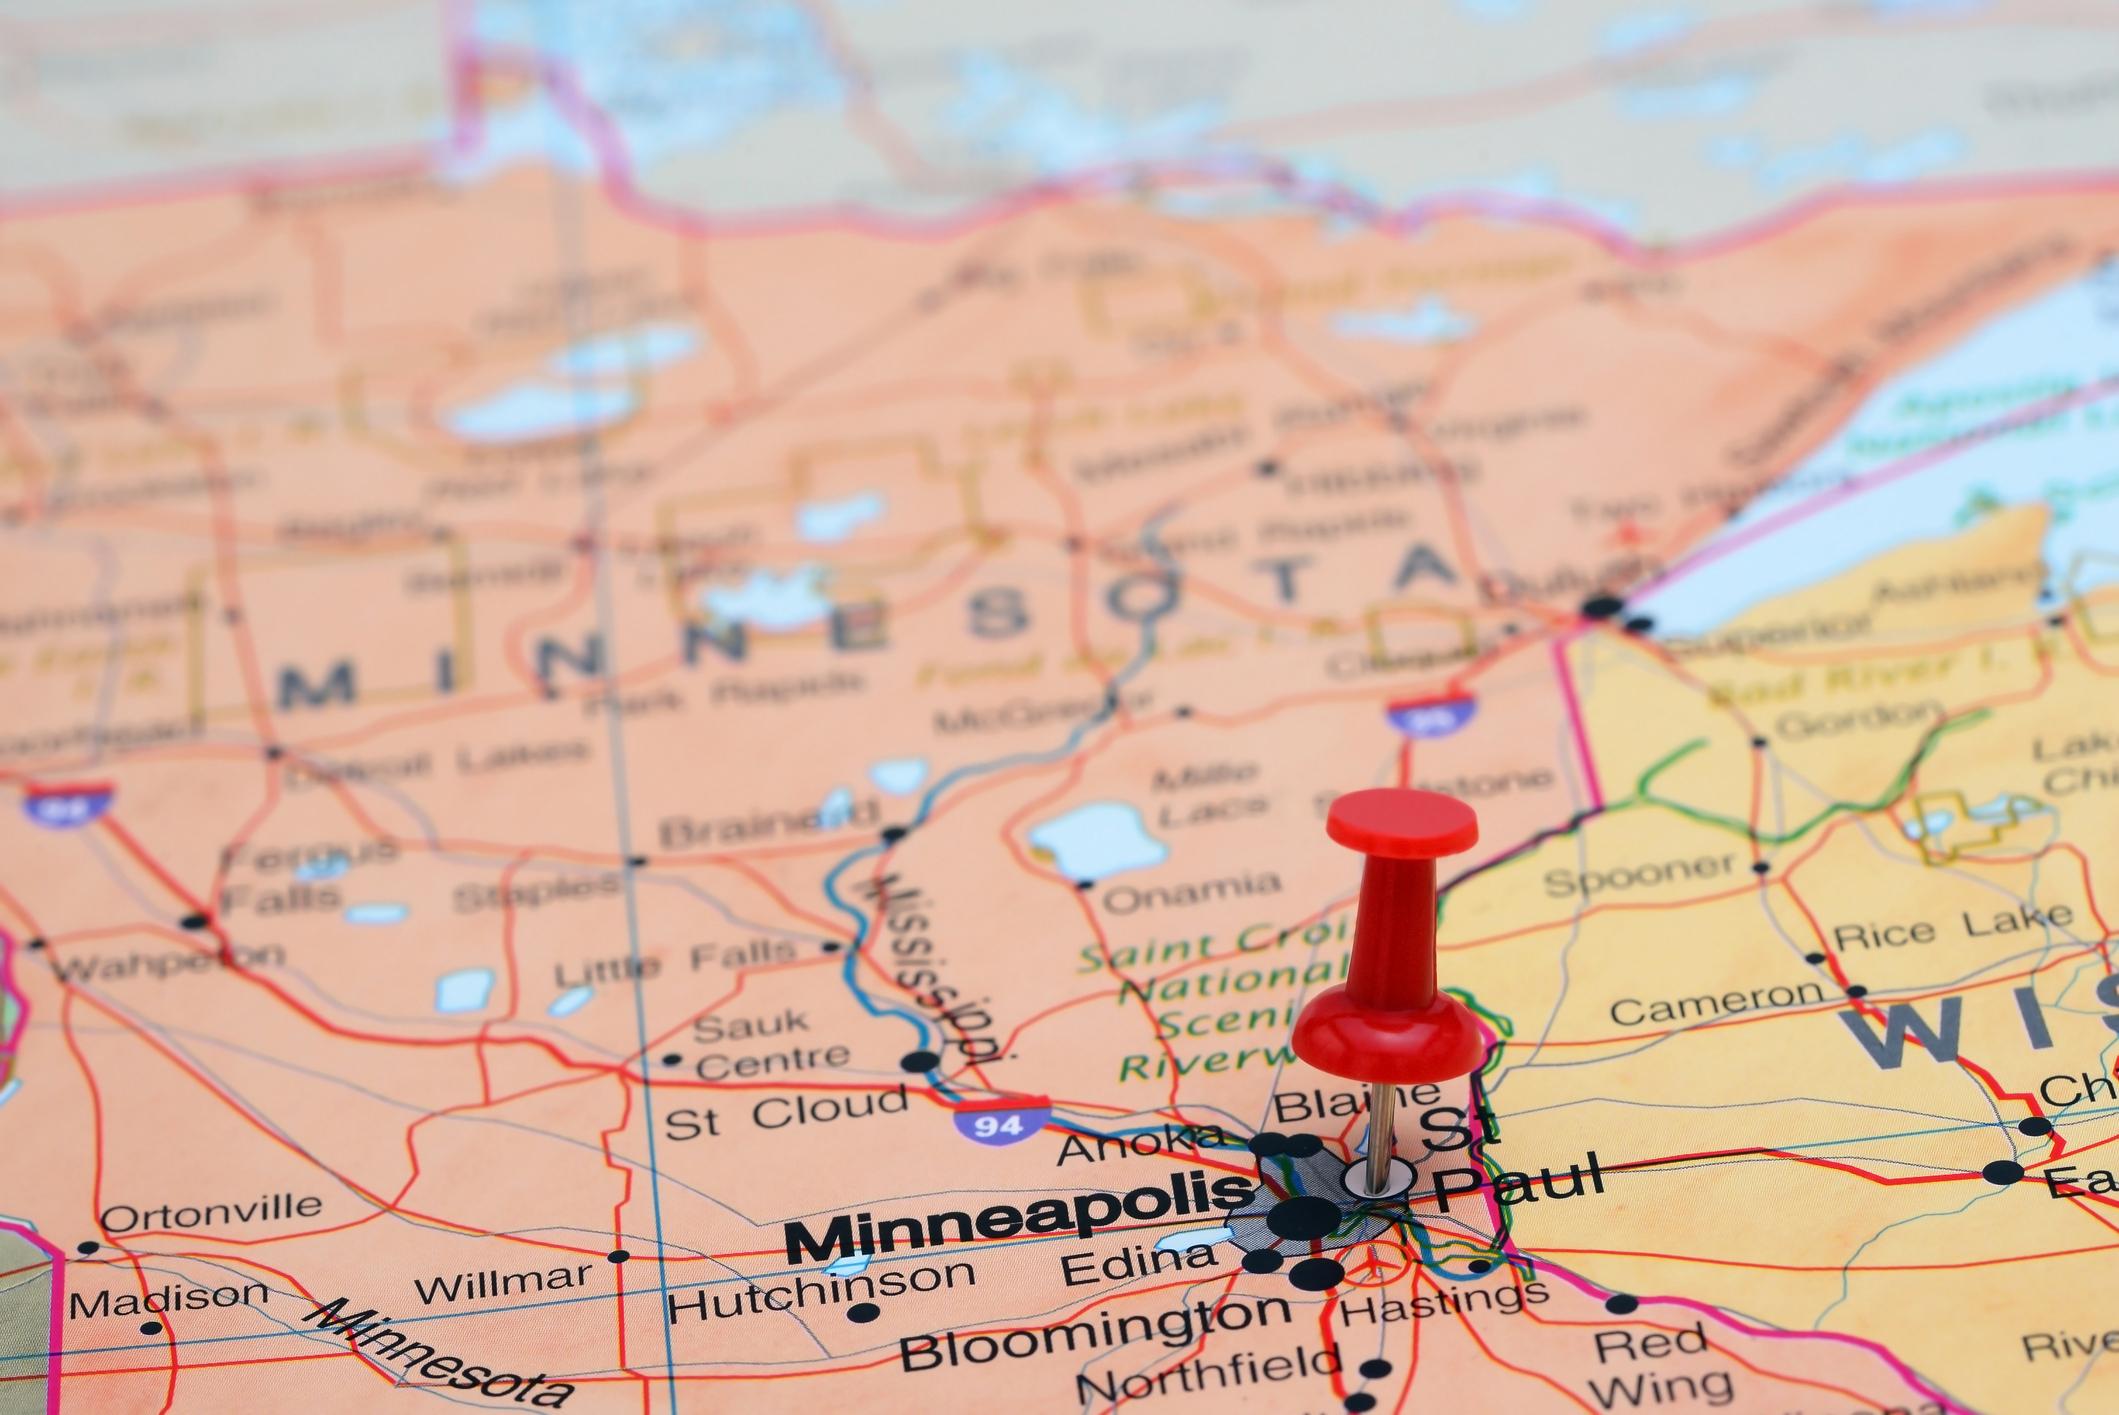 Minnesota companies